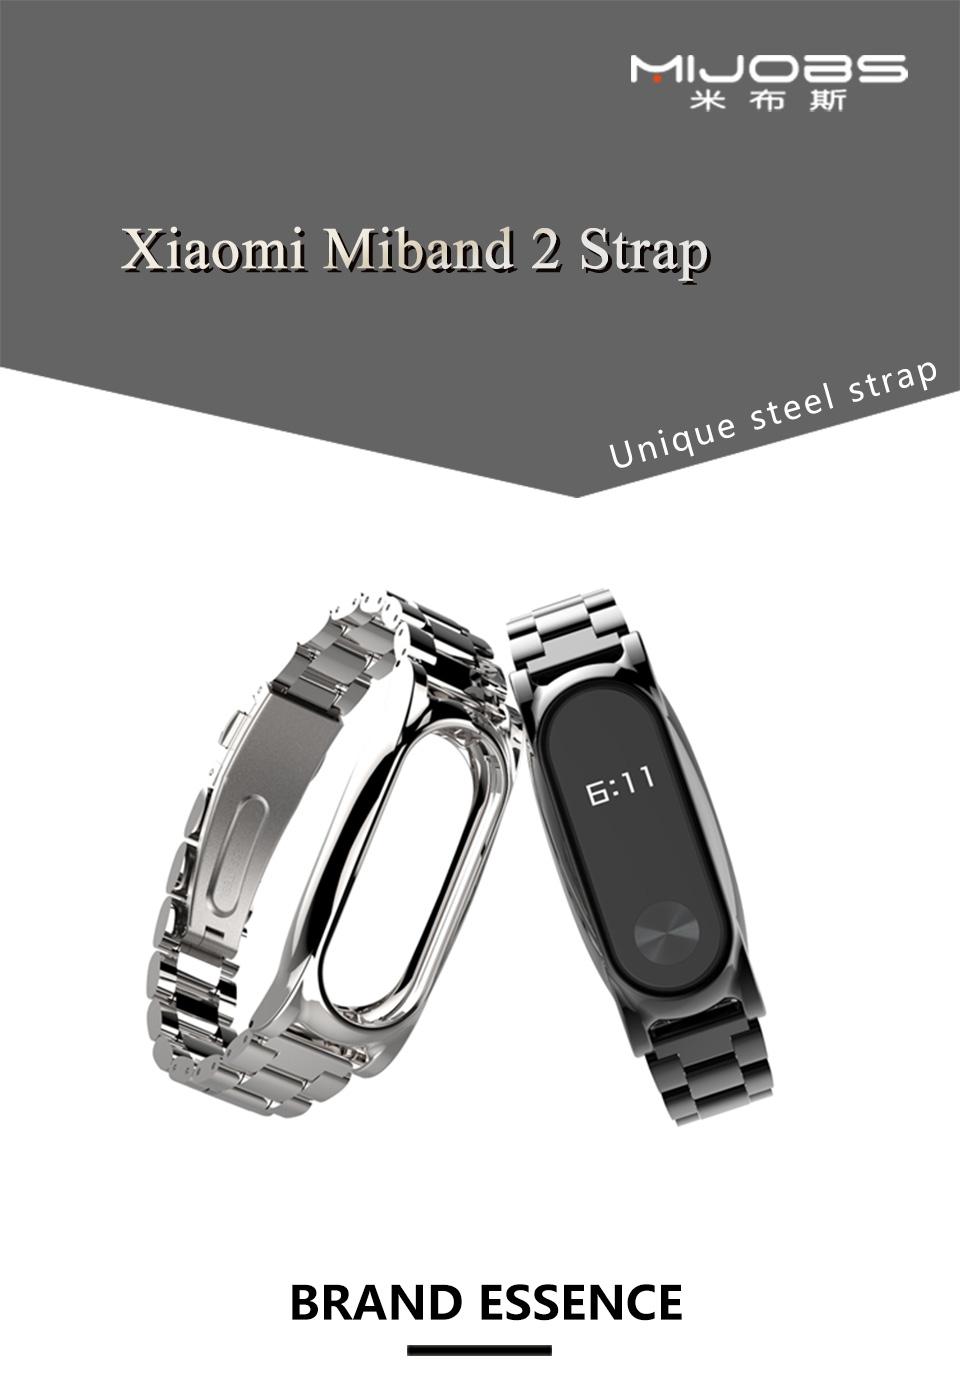 Original Stainless Steel Metal Plus Fitbit Free tool Xiaomi miband 2 Smart Bracelet Replacement Fitness Tracker mi Accessories 3